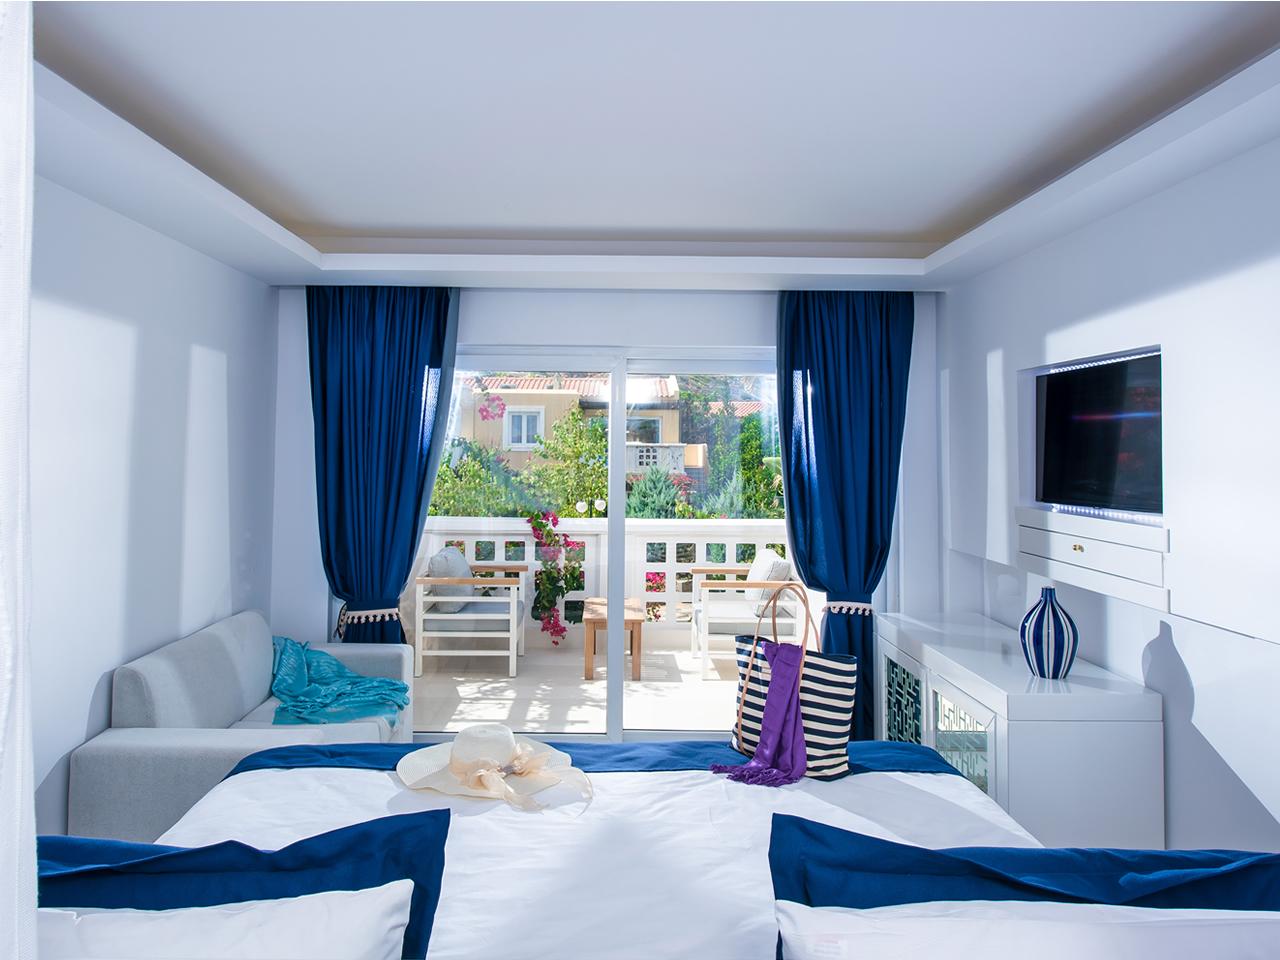 rooms-2_1280x960